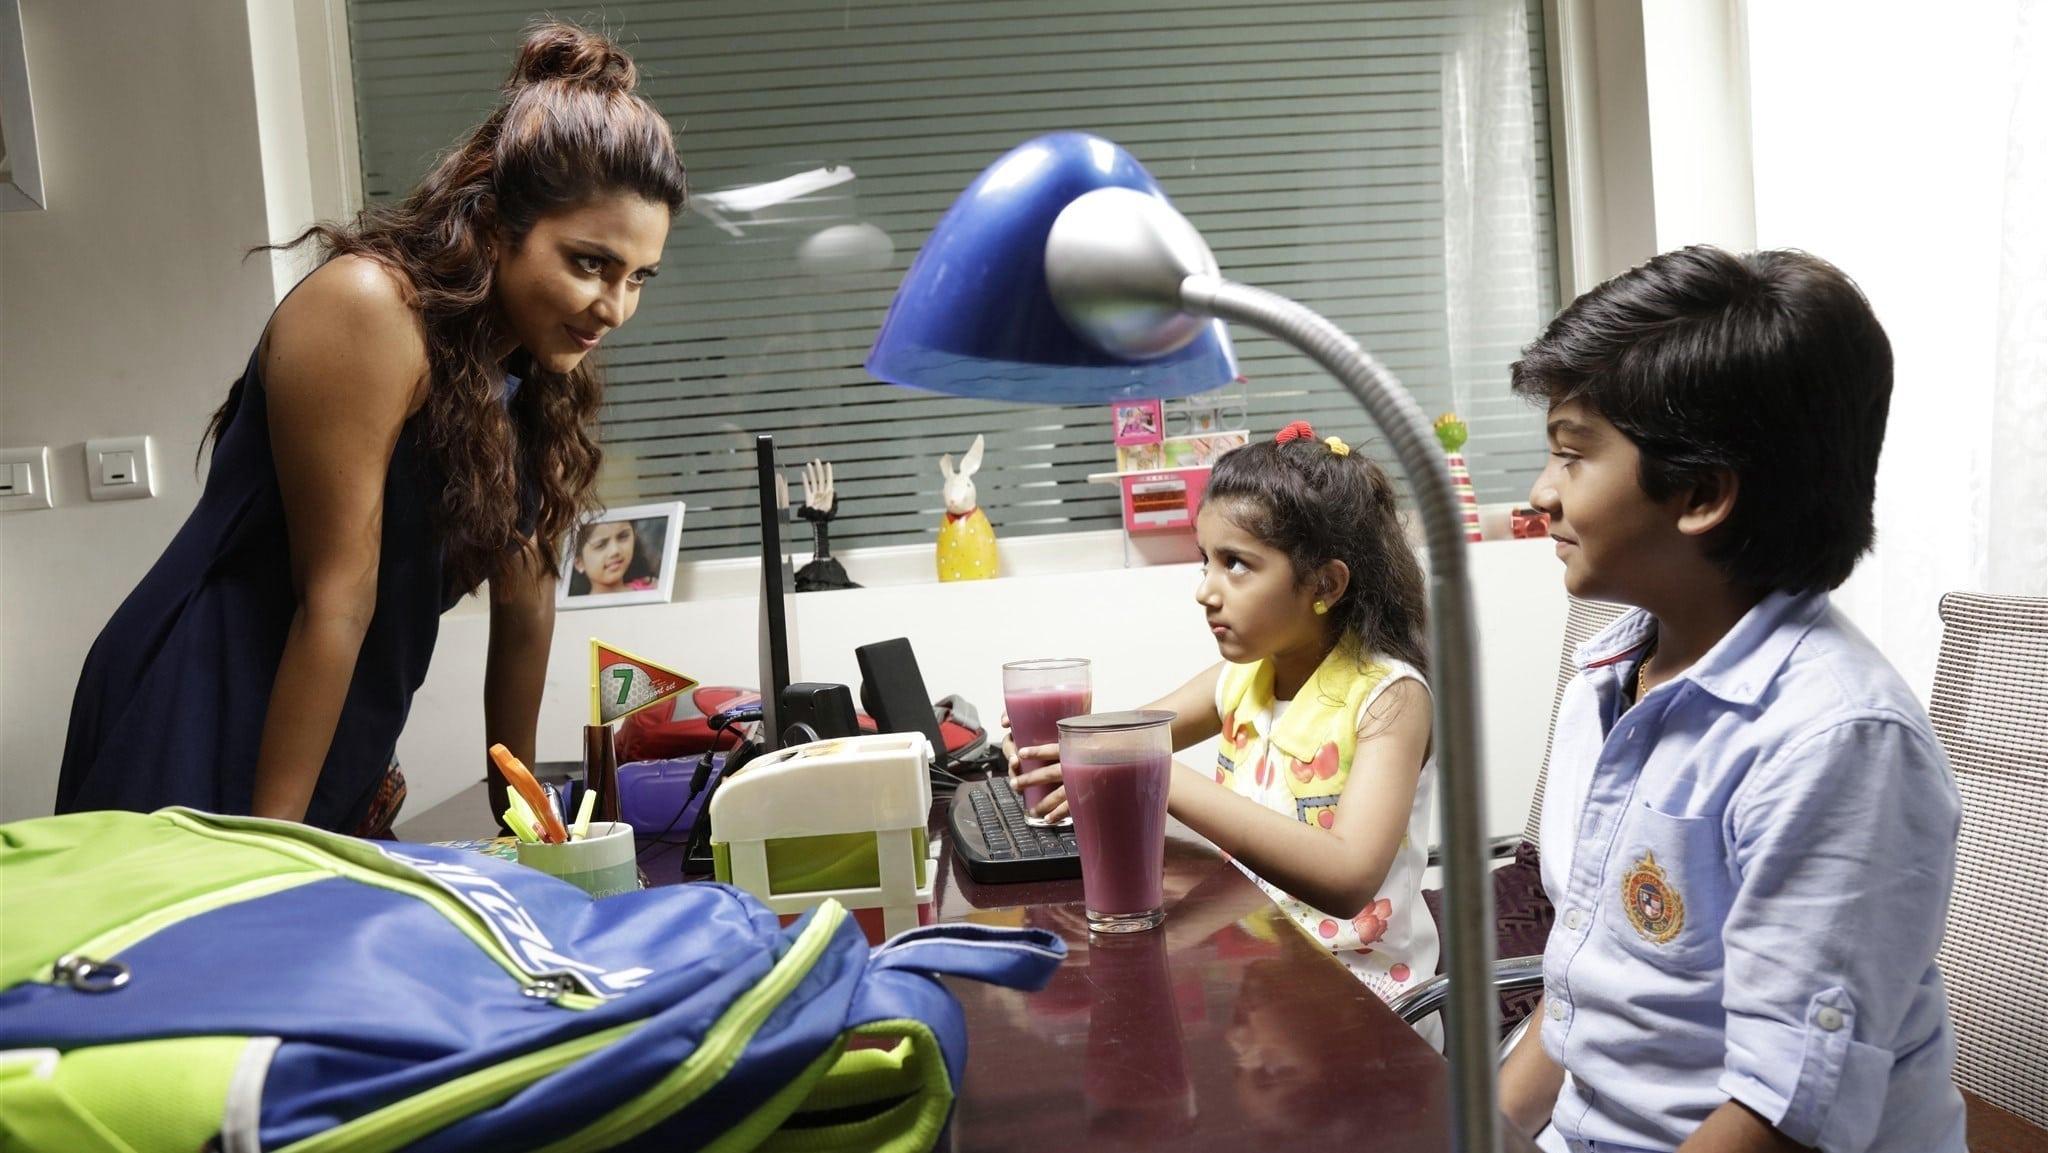 Bhaskar Oru Rascal 2018 Hdrip Full Movie Watch Online Tamil Full